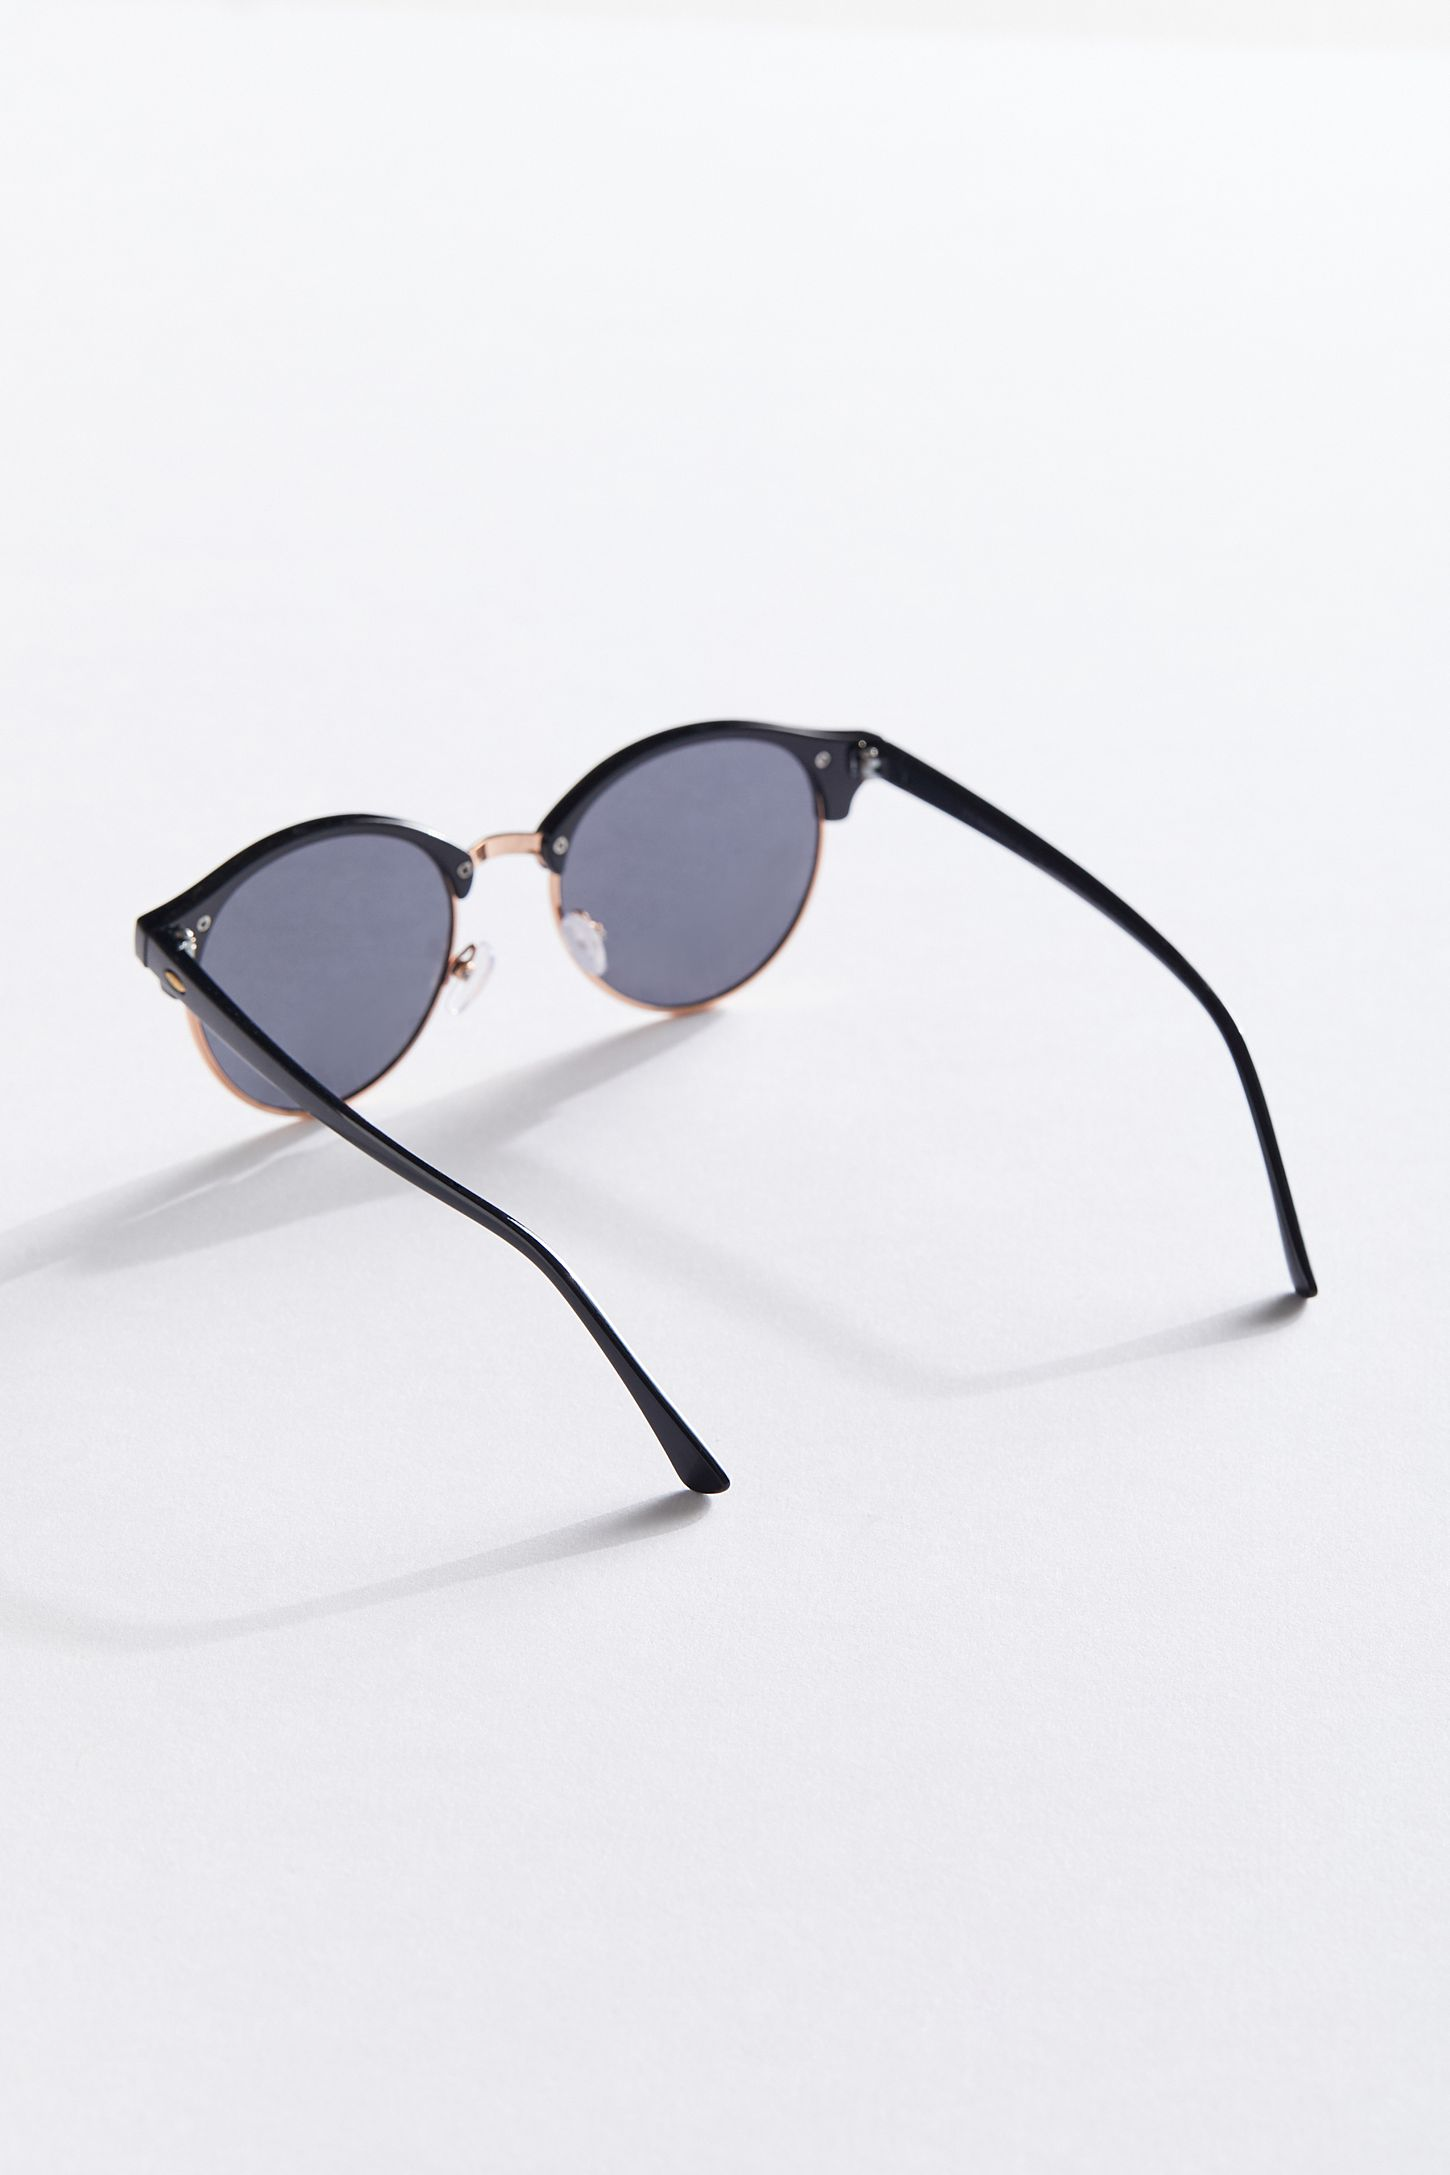 a6d00078c9f1f Slide View  3  Round Half-Frame Sunglasses